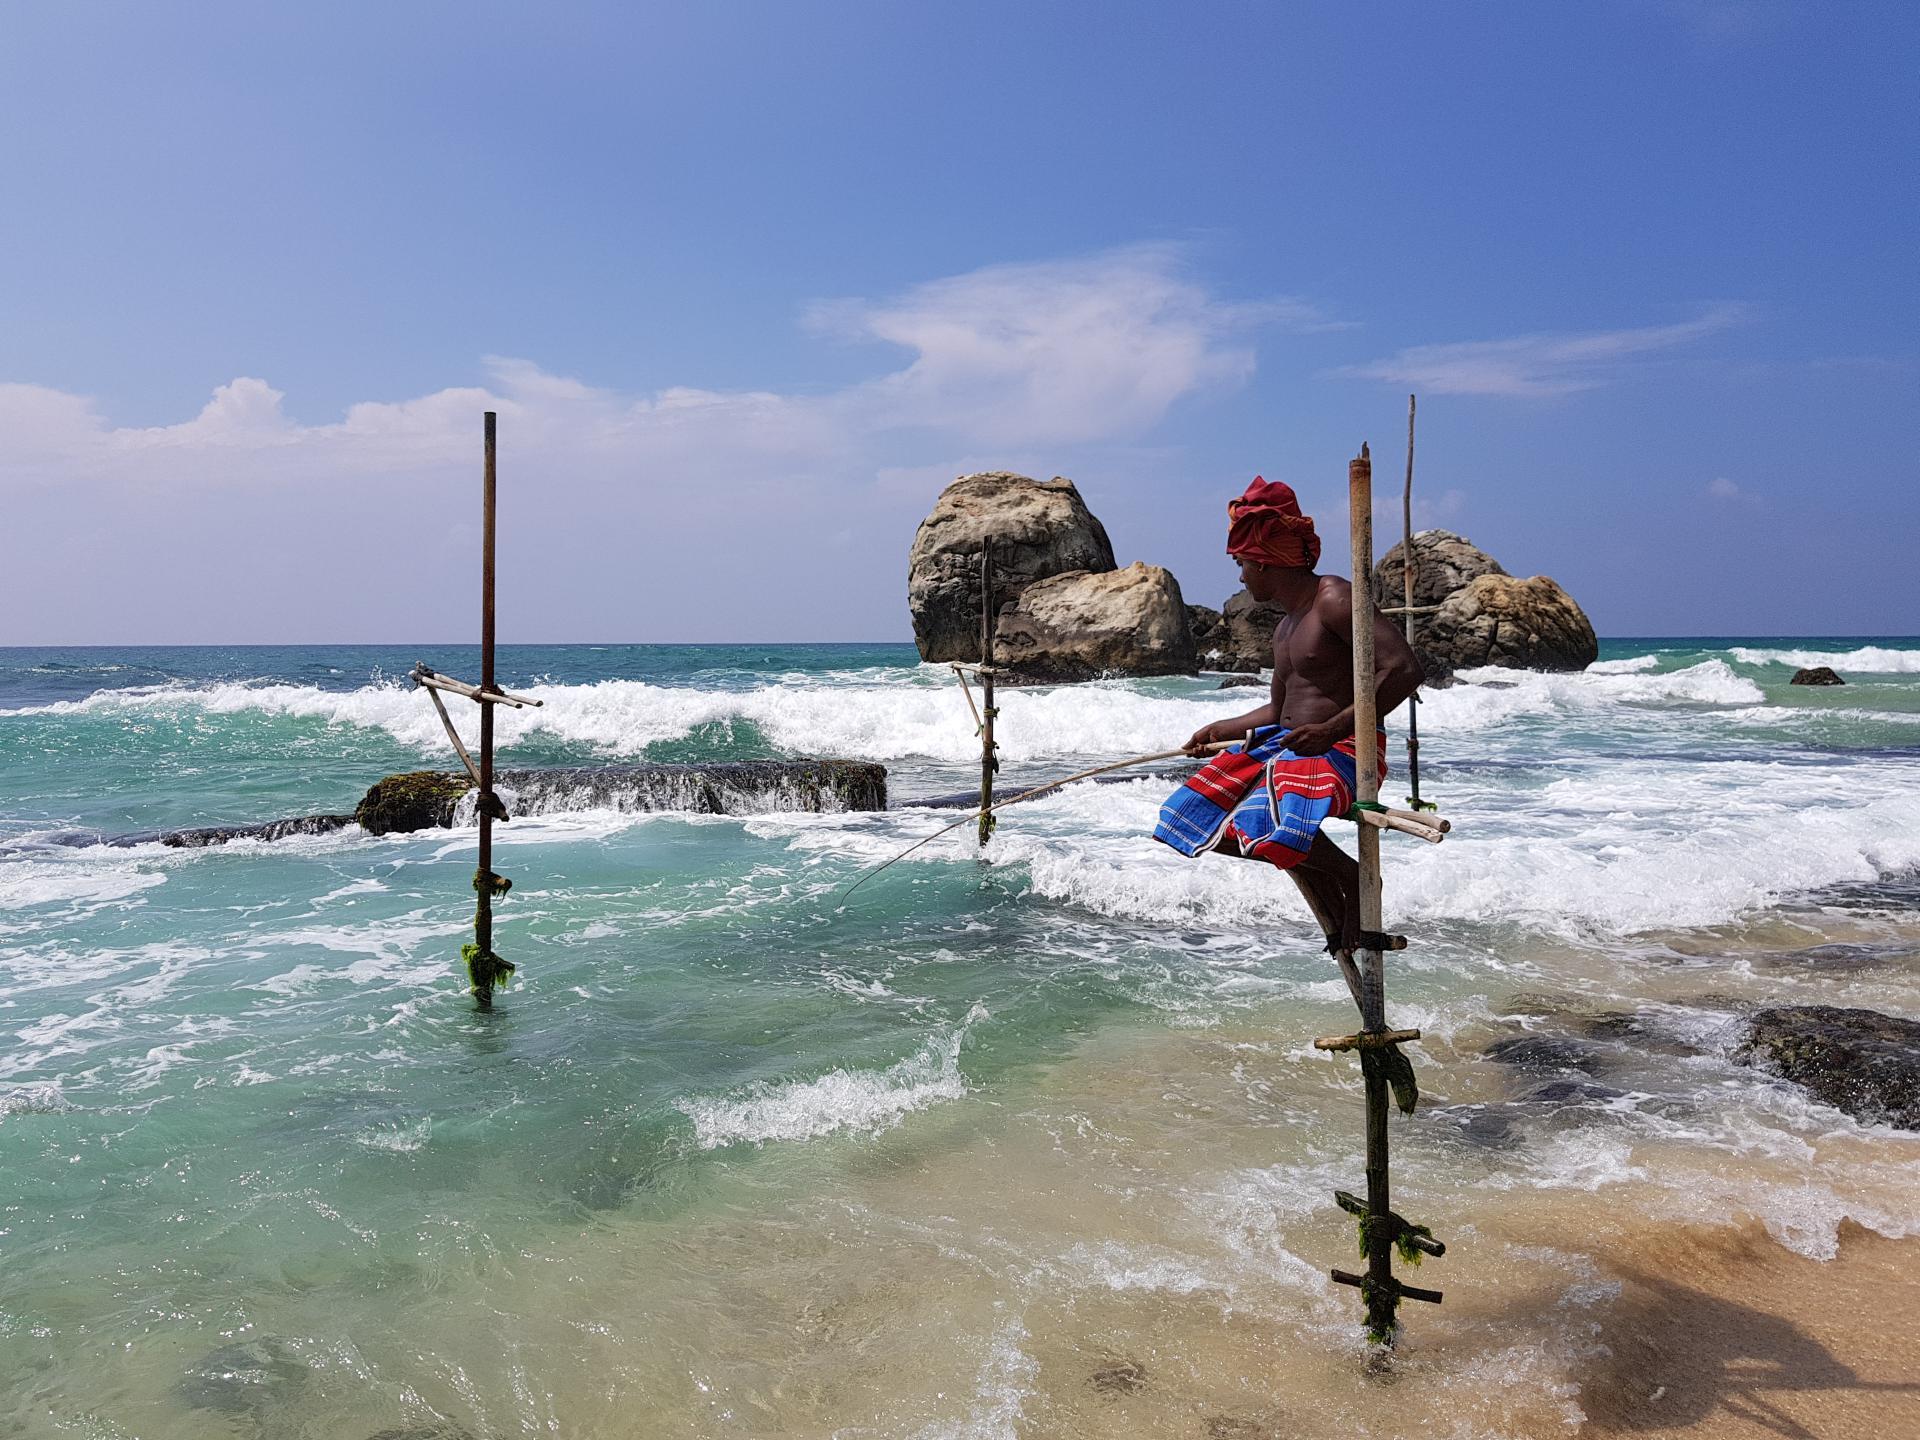 Рыбак на шесте, Шри-Ланка